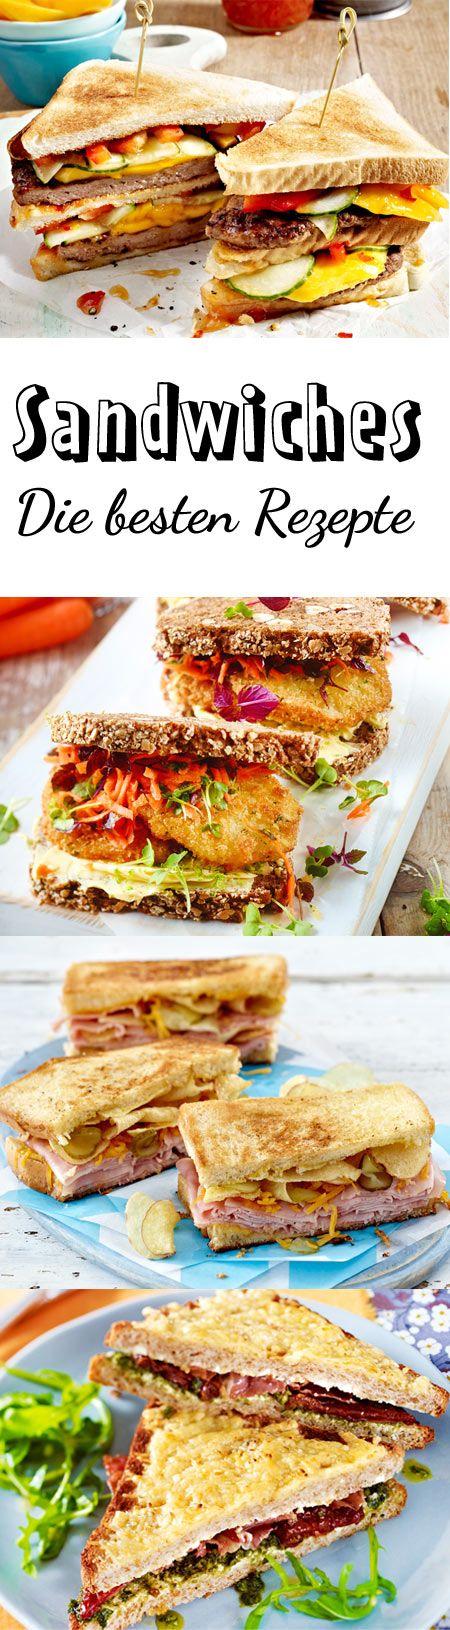 Sandwich-Rezepte – belegte Brote deluxe!